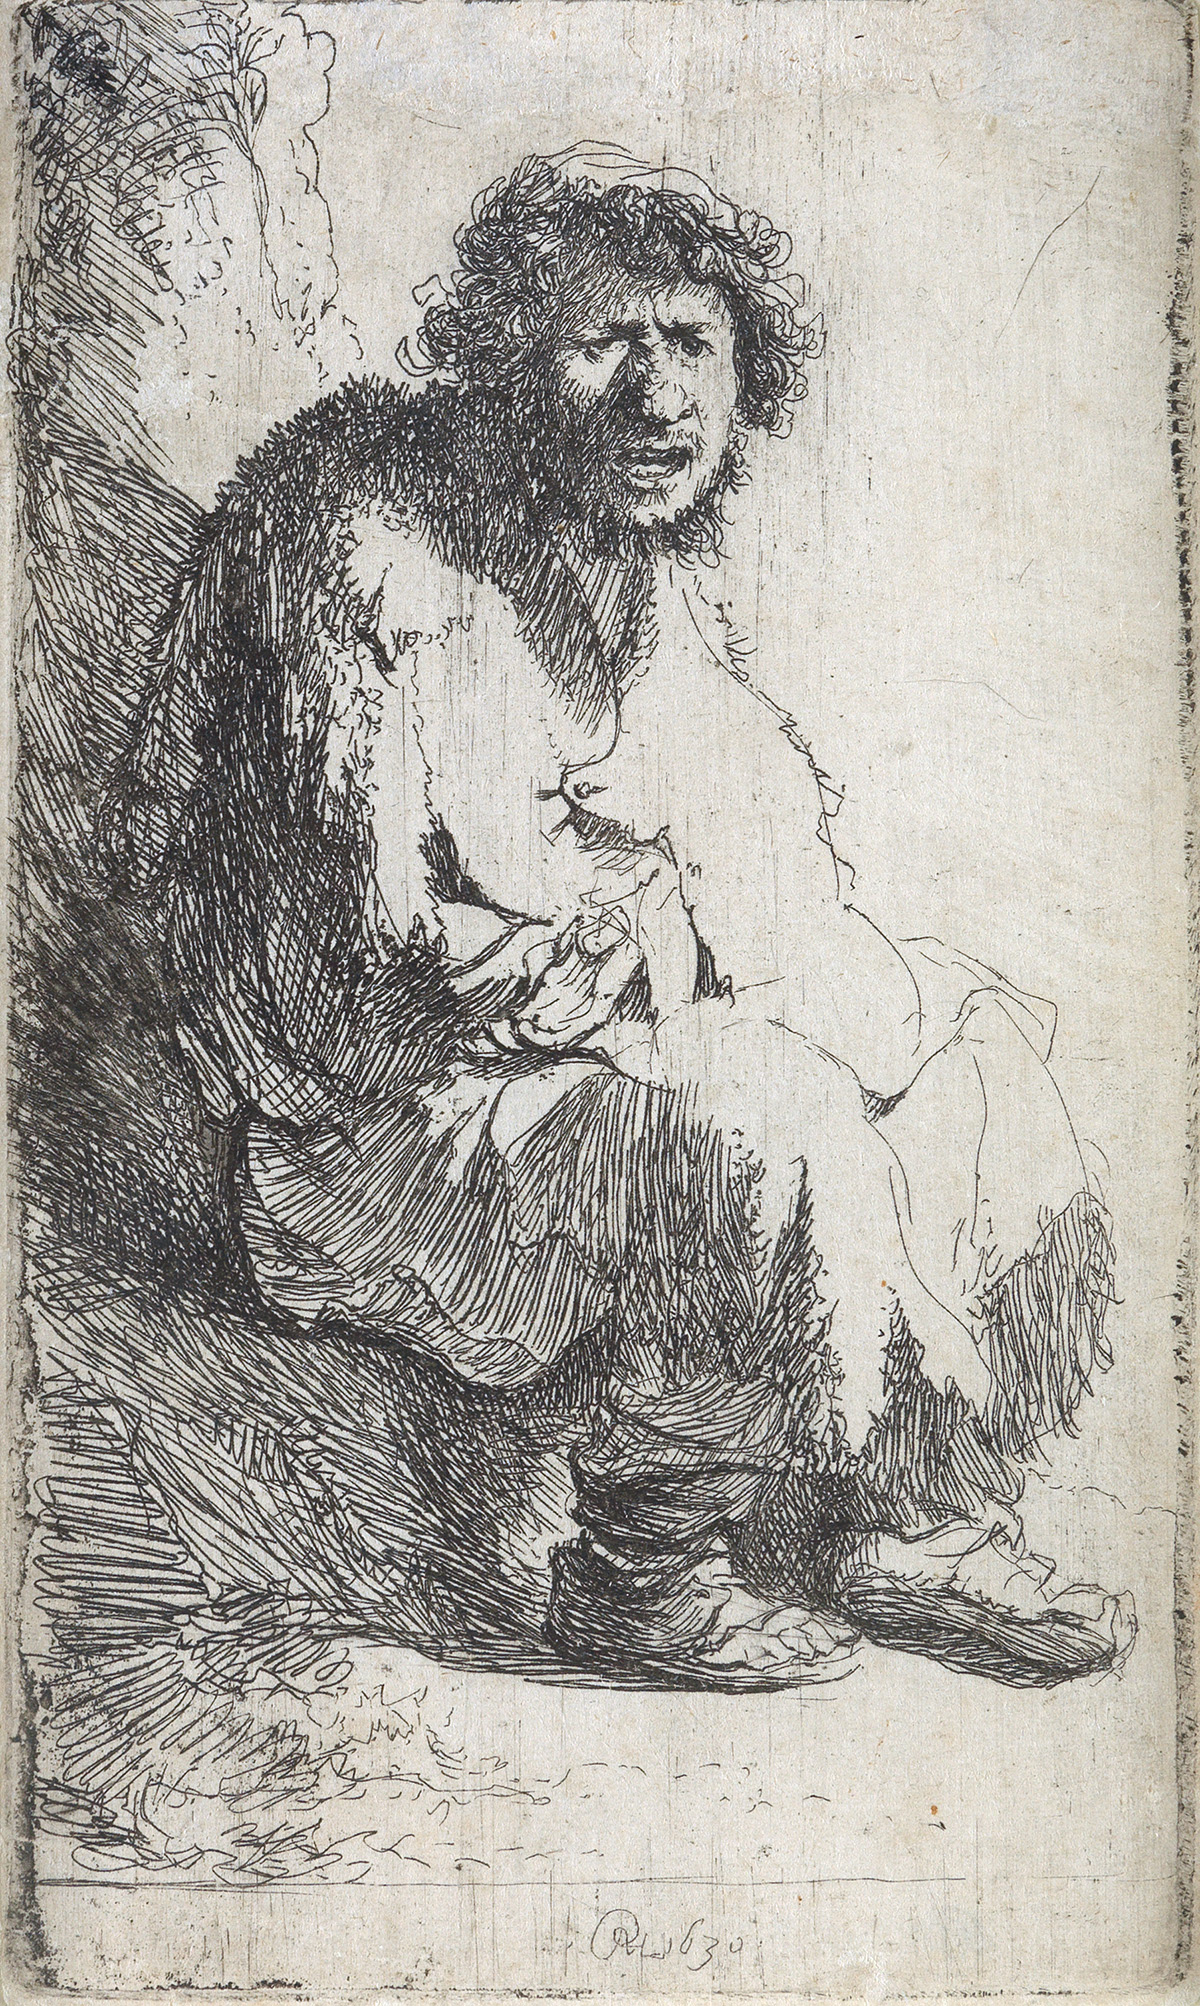 REMBRANDT-VAN-RIJN-A-Beggar-Seated-on-a-Bank